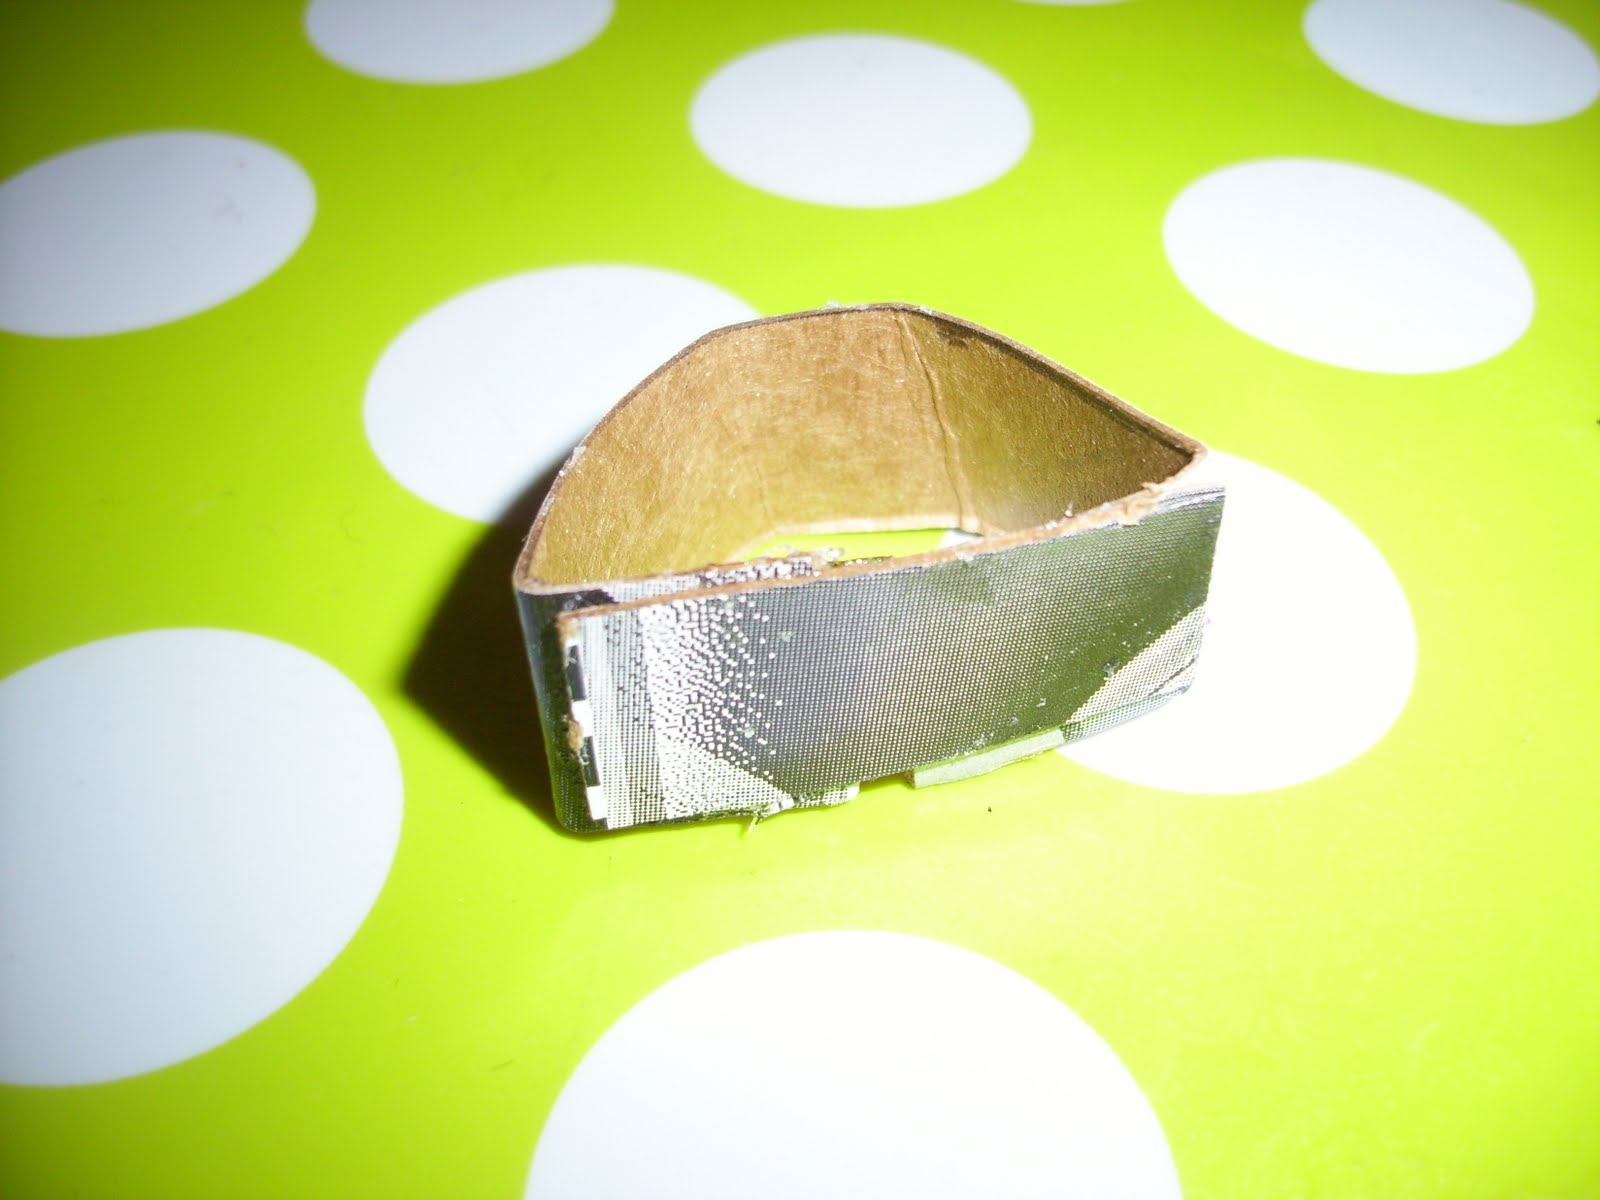 http://4.bp.blogspot.com/_E2PjKGxzTJo/TCfpH8kjIPI/AAAAAAAAFtQ/cM3VKET7WUo/s1600/KC+glue.JPG